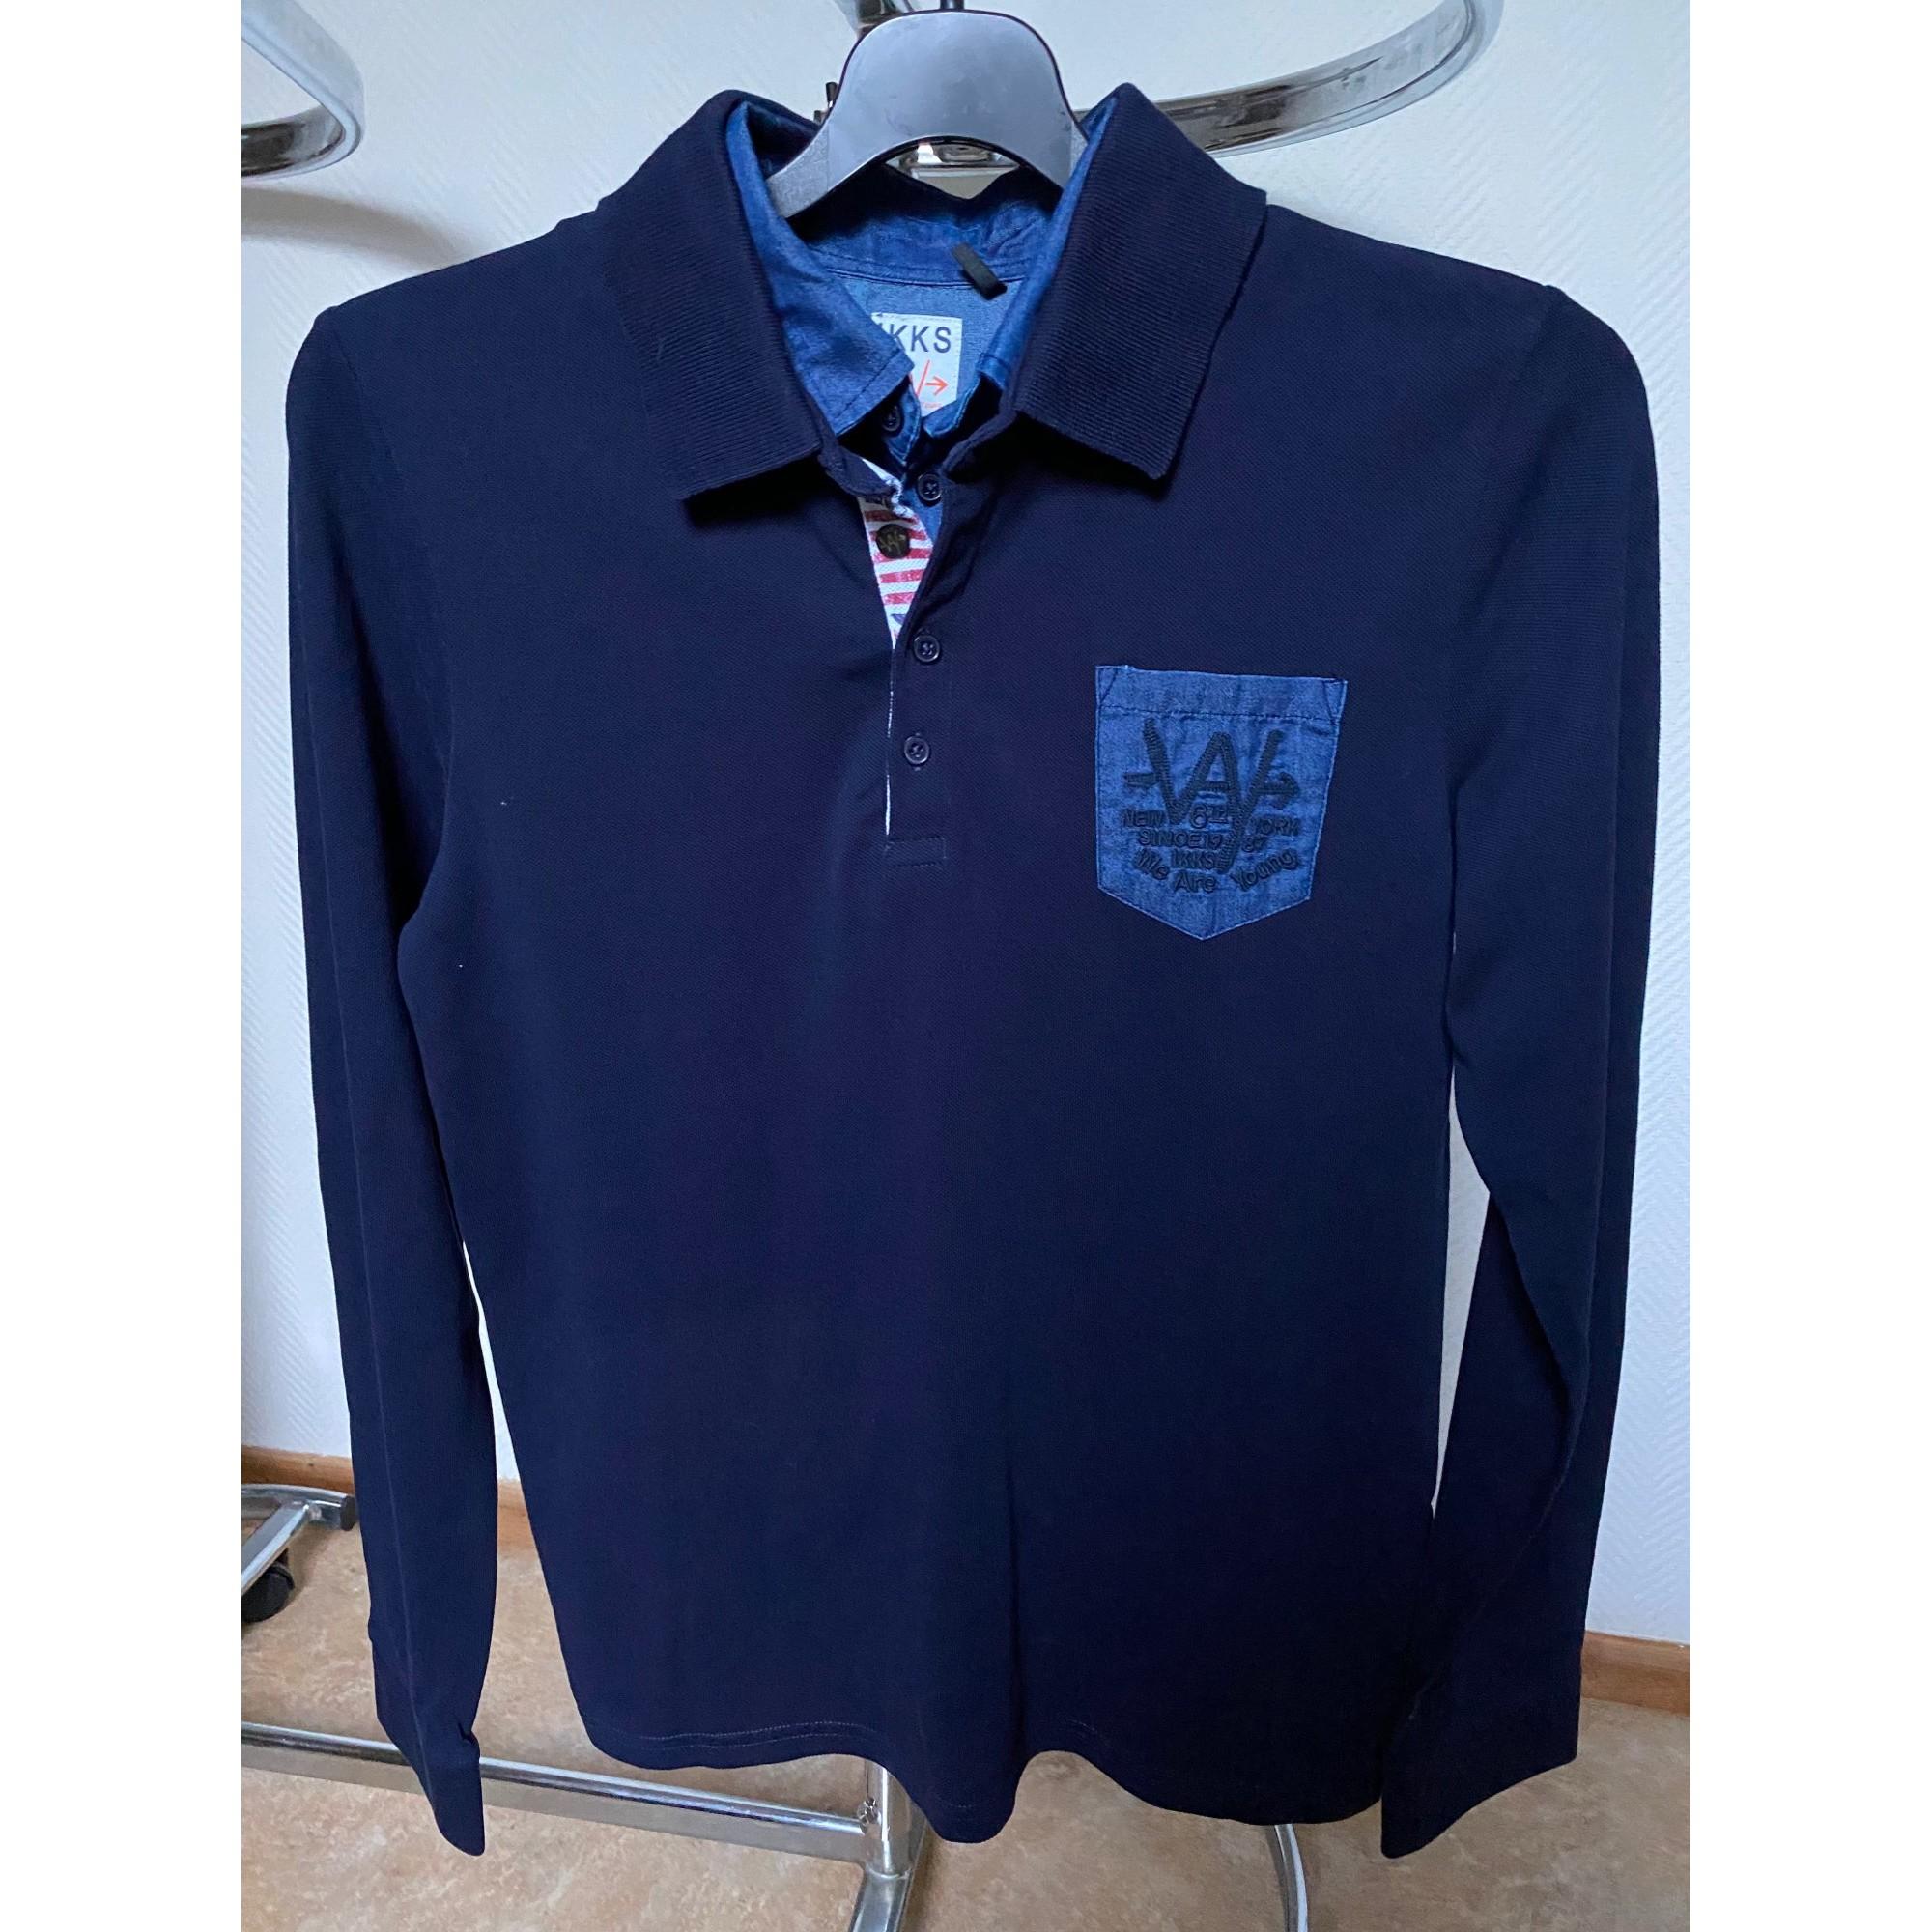 Polo IKKS Bleu, bleu marine, bleu turquoise